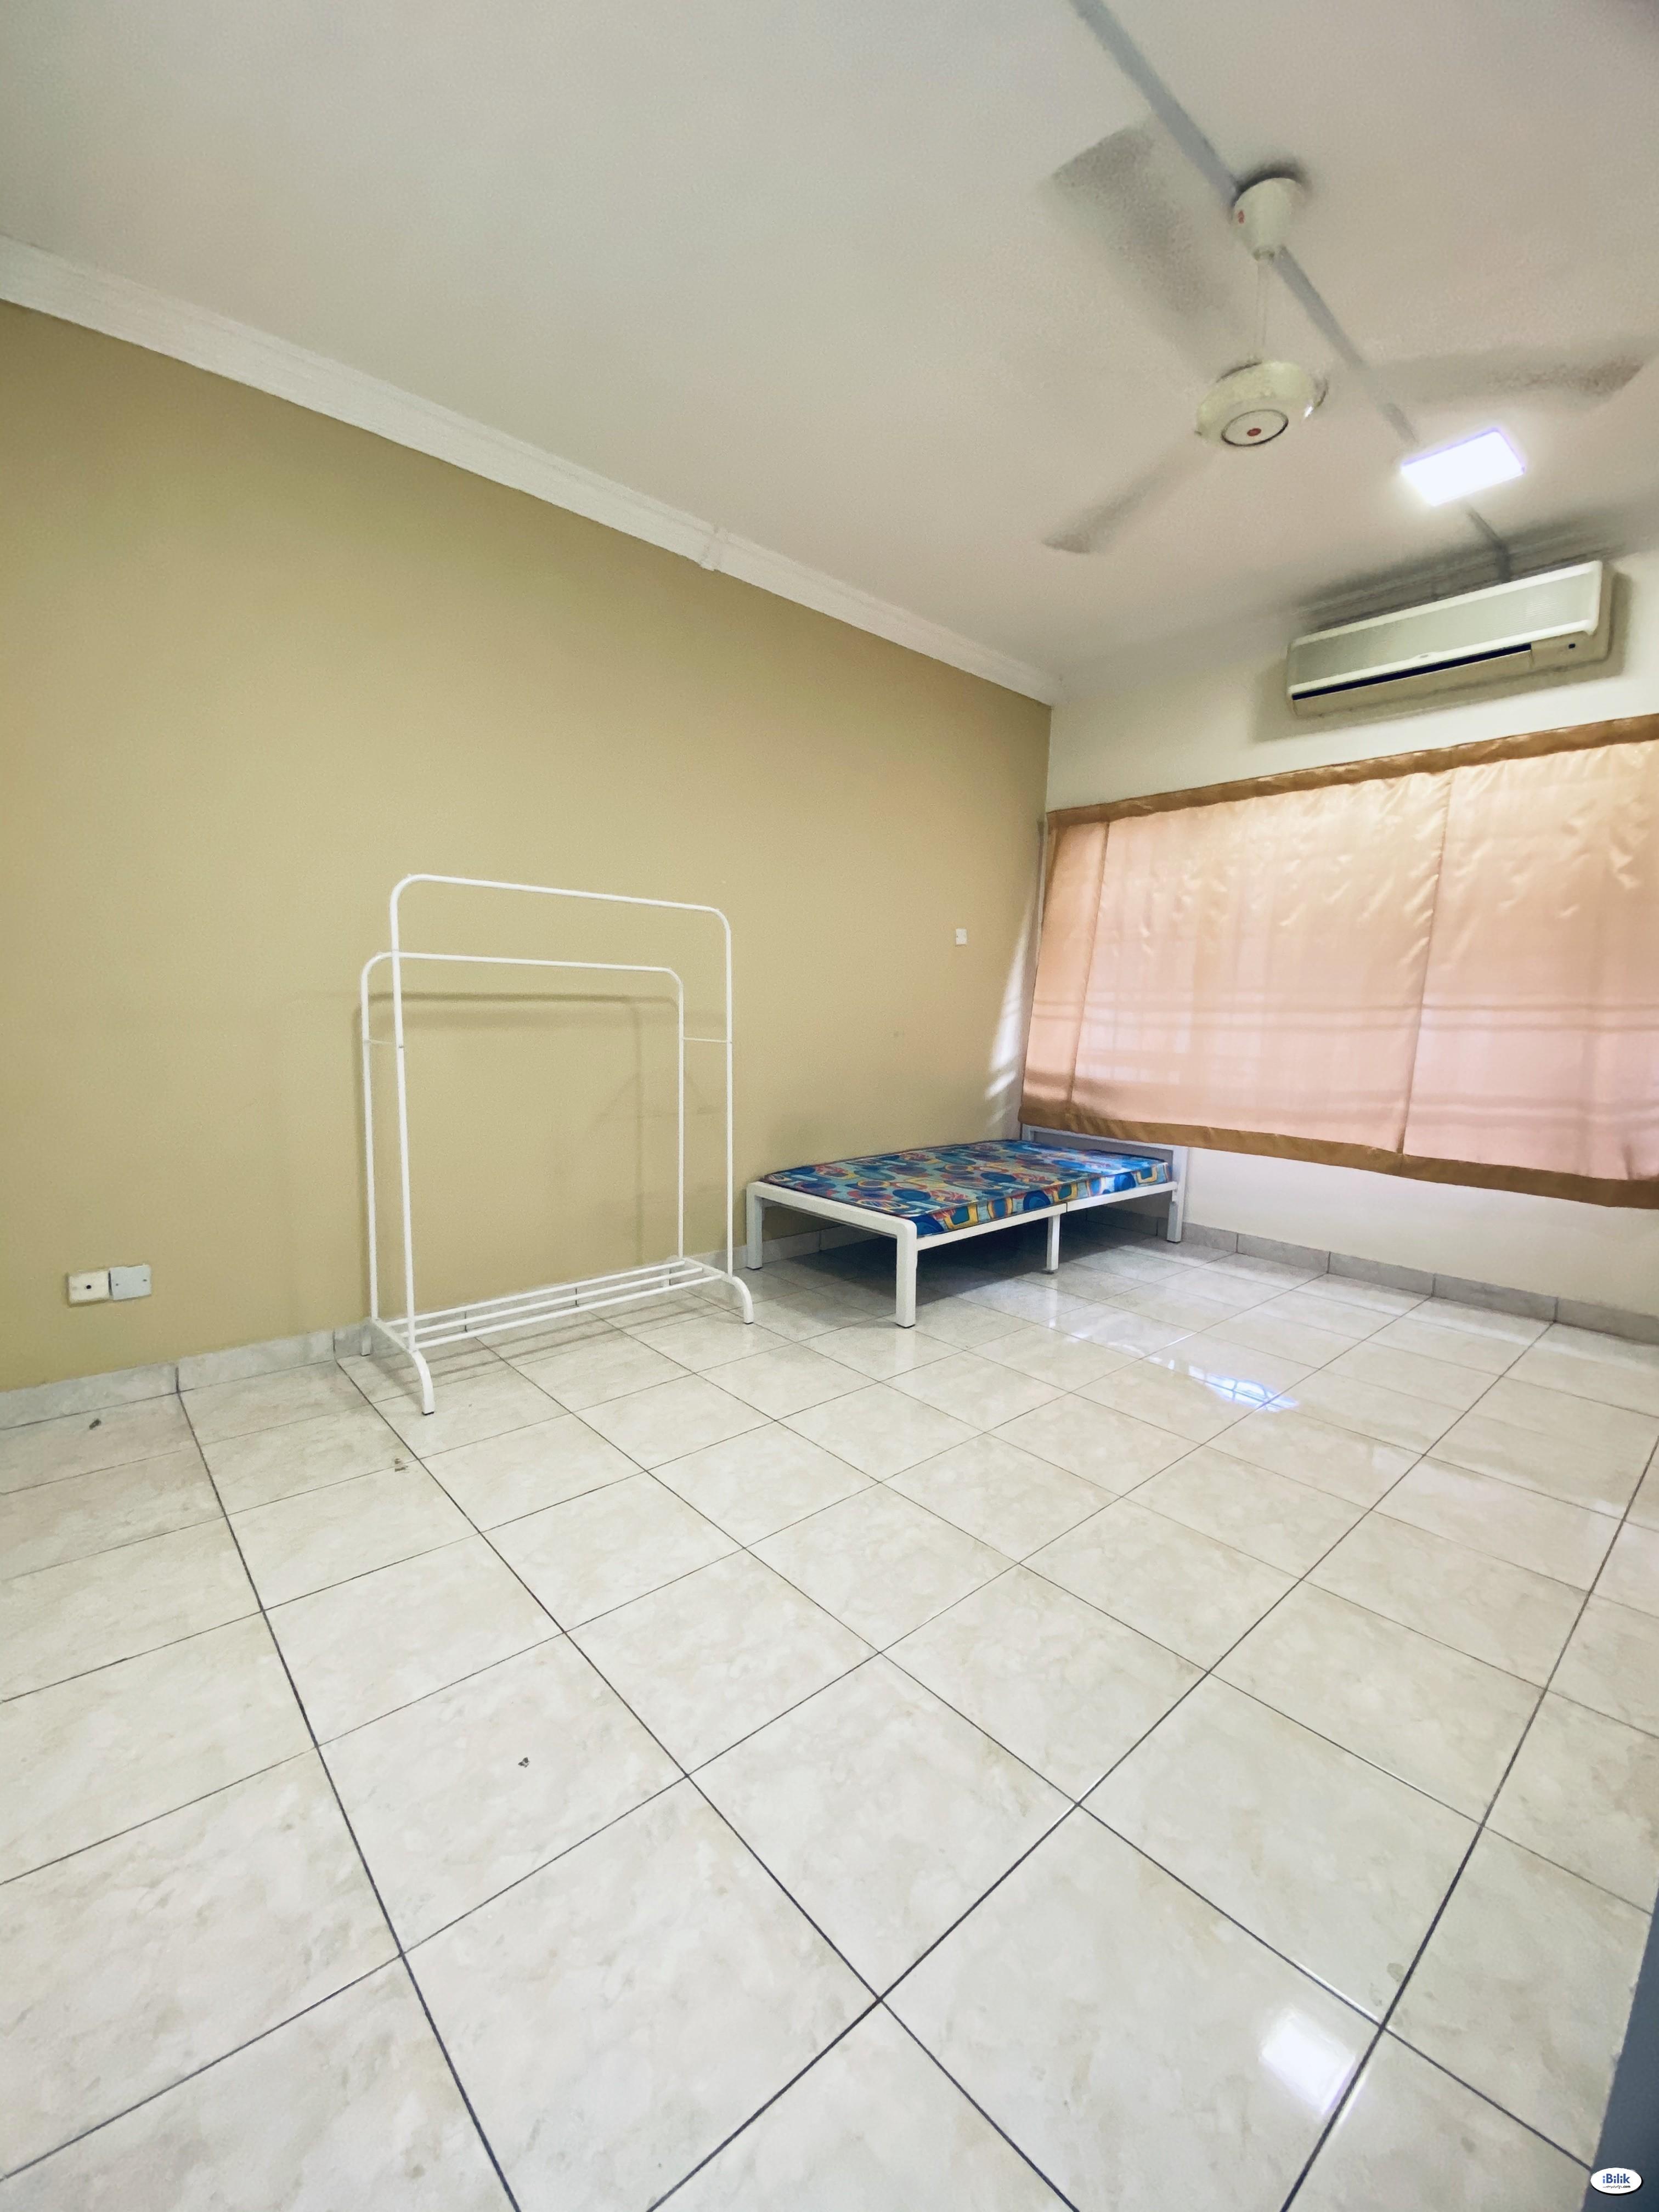 ⚡Rental Included WI-FI / Middle Room at BU7, Bandar Utama with Low Deposit⚡